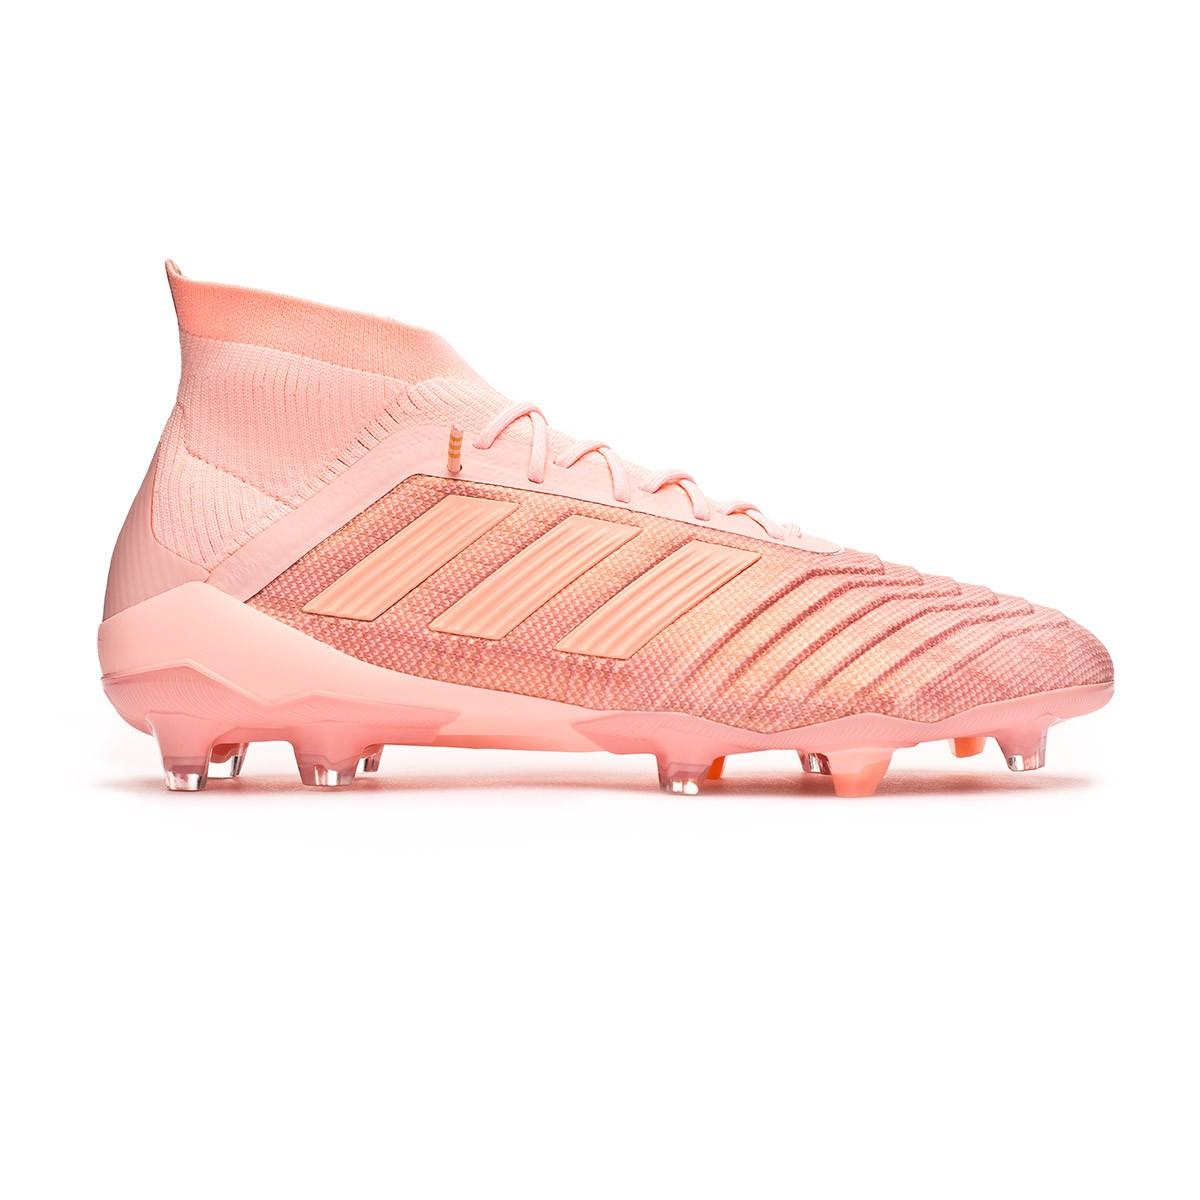 053fbe0b3186aa Boot adidas Predator 18.1 FG Clear orange-Trace pink - Football store  Fútbol Emotion